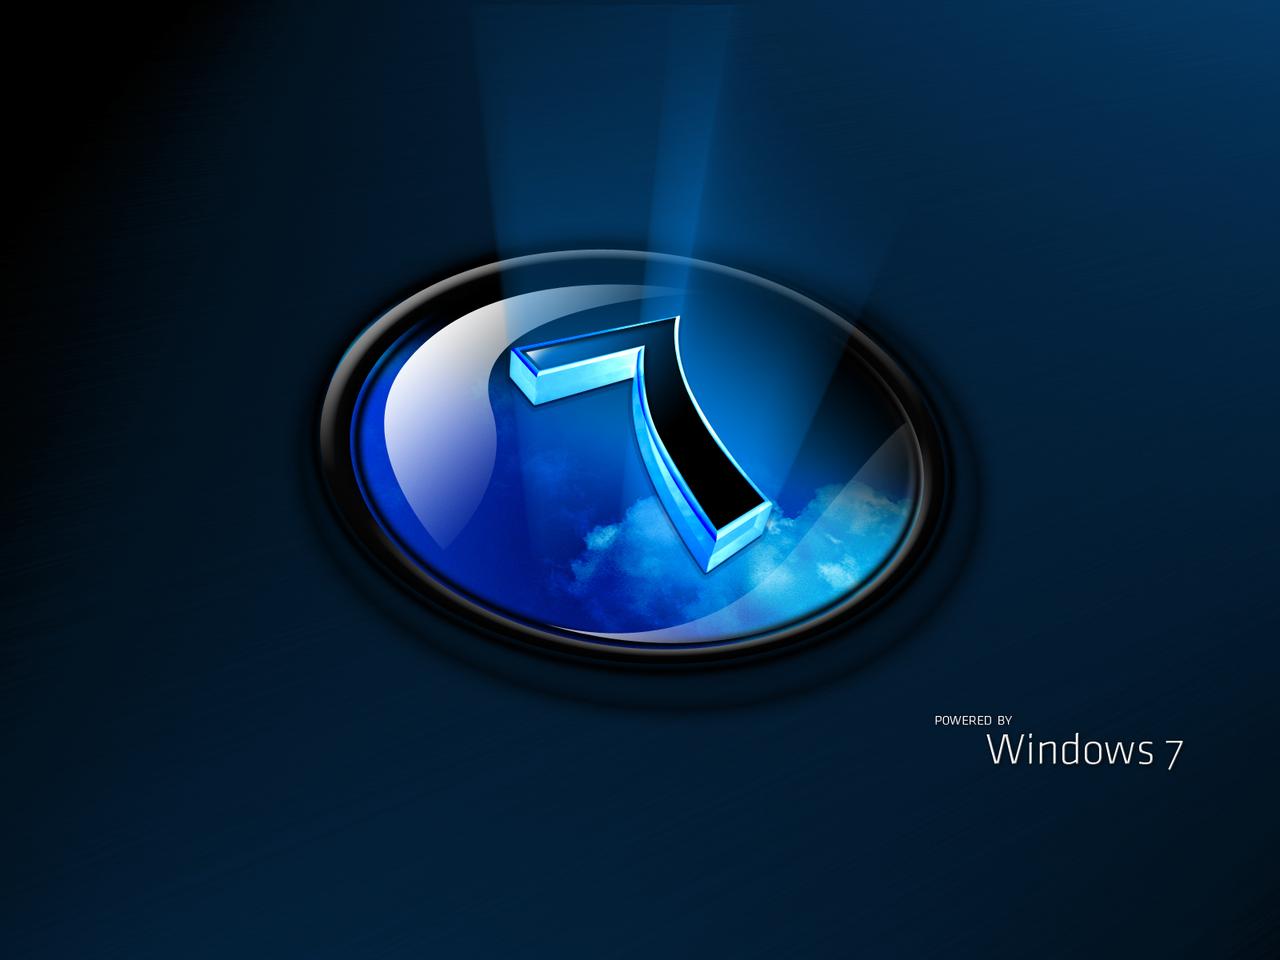 http://3.bp.blogspot.com/-46wrlnVlLyo/TlSpEal5E2I/AAAAAAAAA_4/_GsgzON5F50/s1600/window7-2.jpg